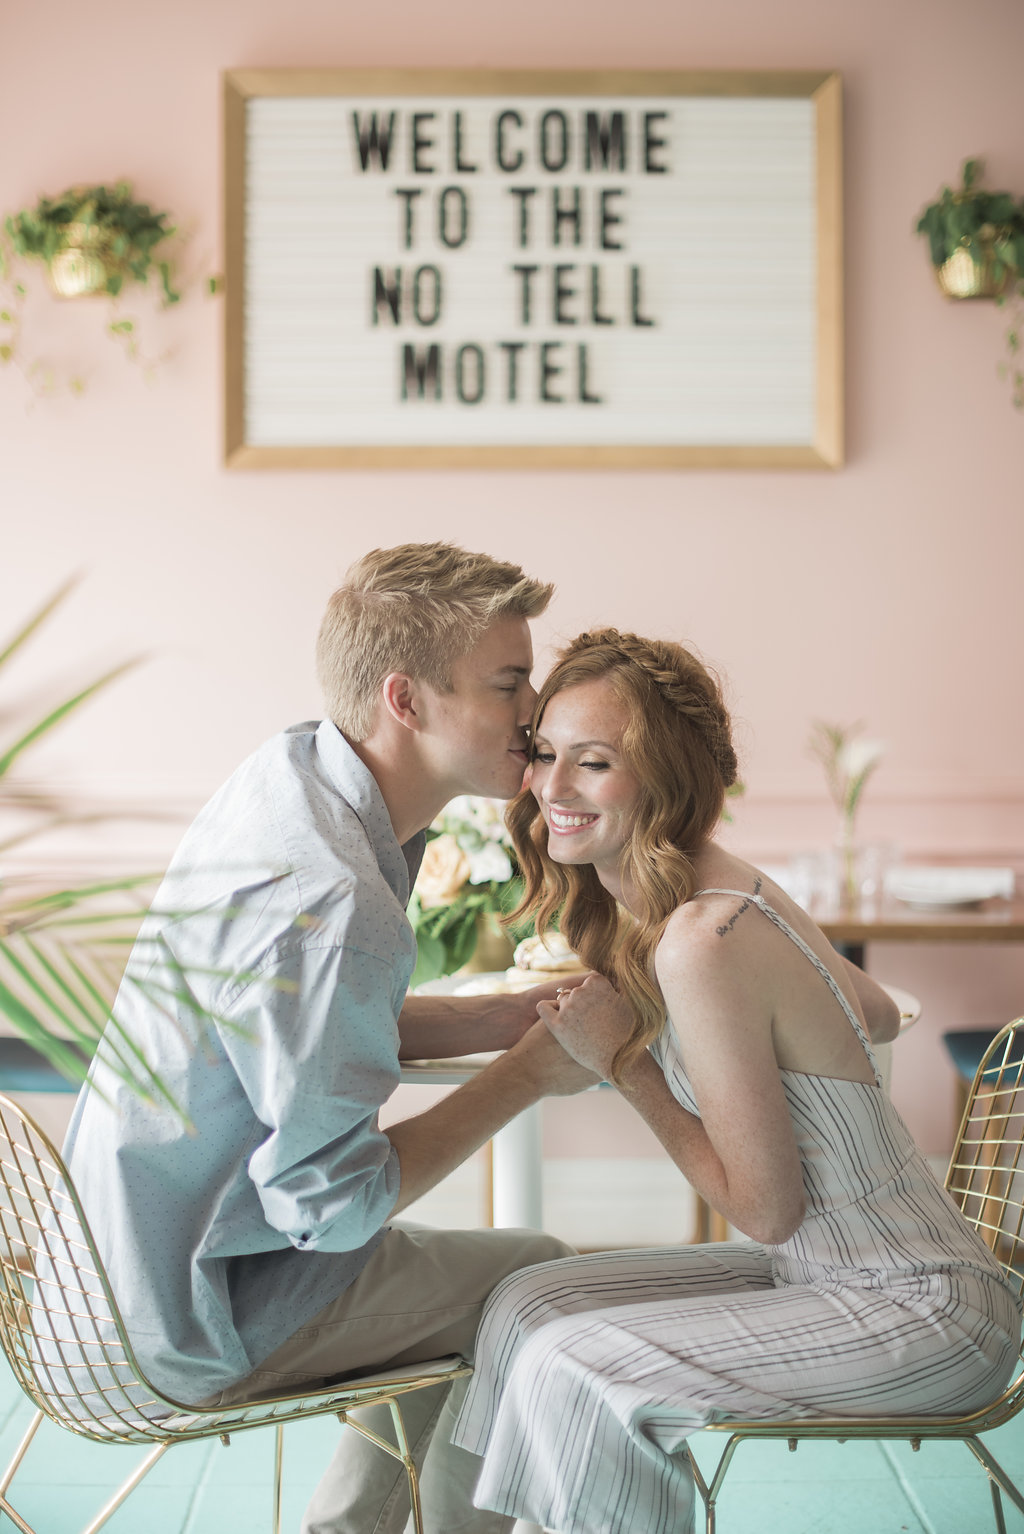 Motel-Restaurant-Editorial-Vineyard-Bride-photo-by-Blynda-DaCosta-Photography-021.JPG